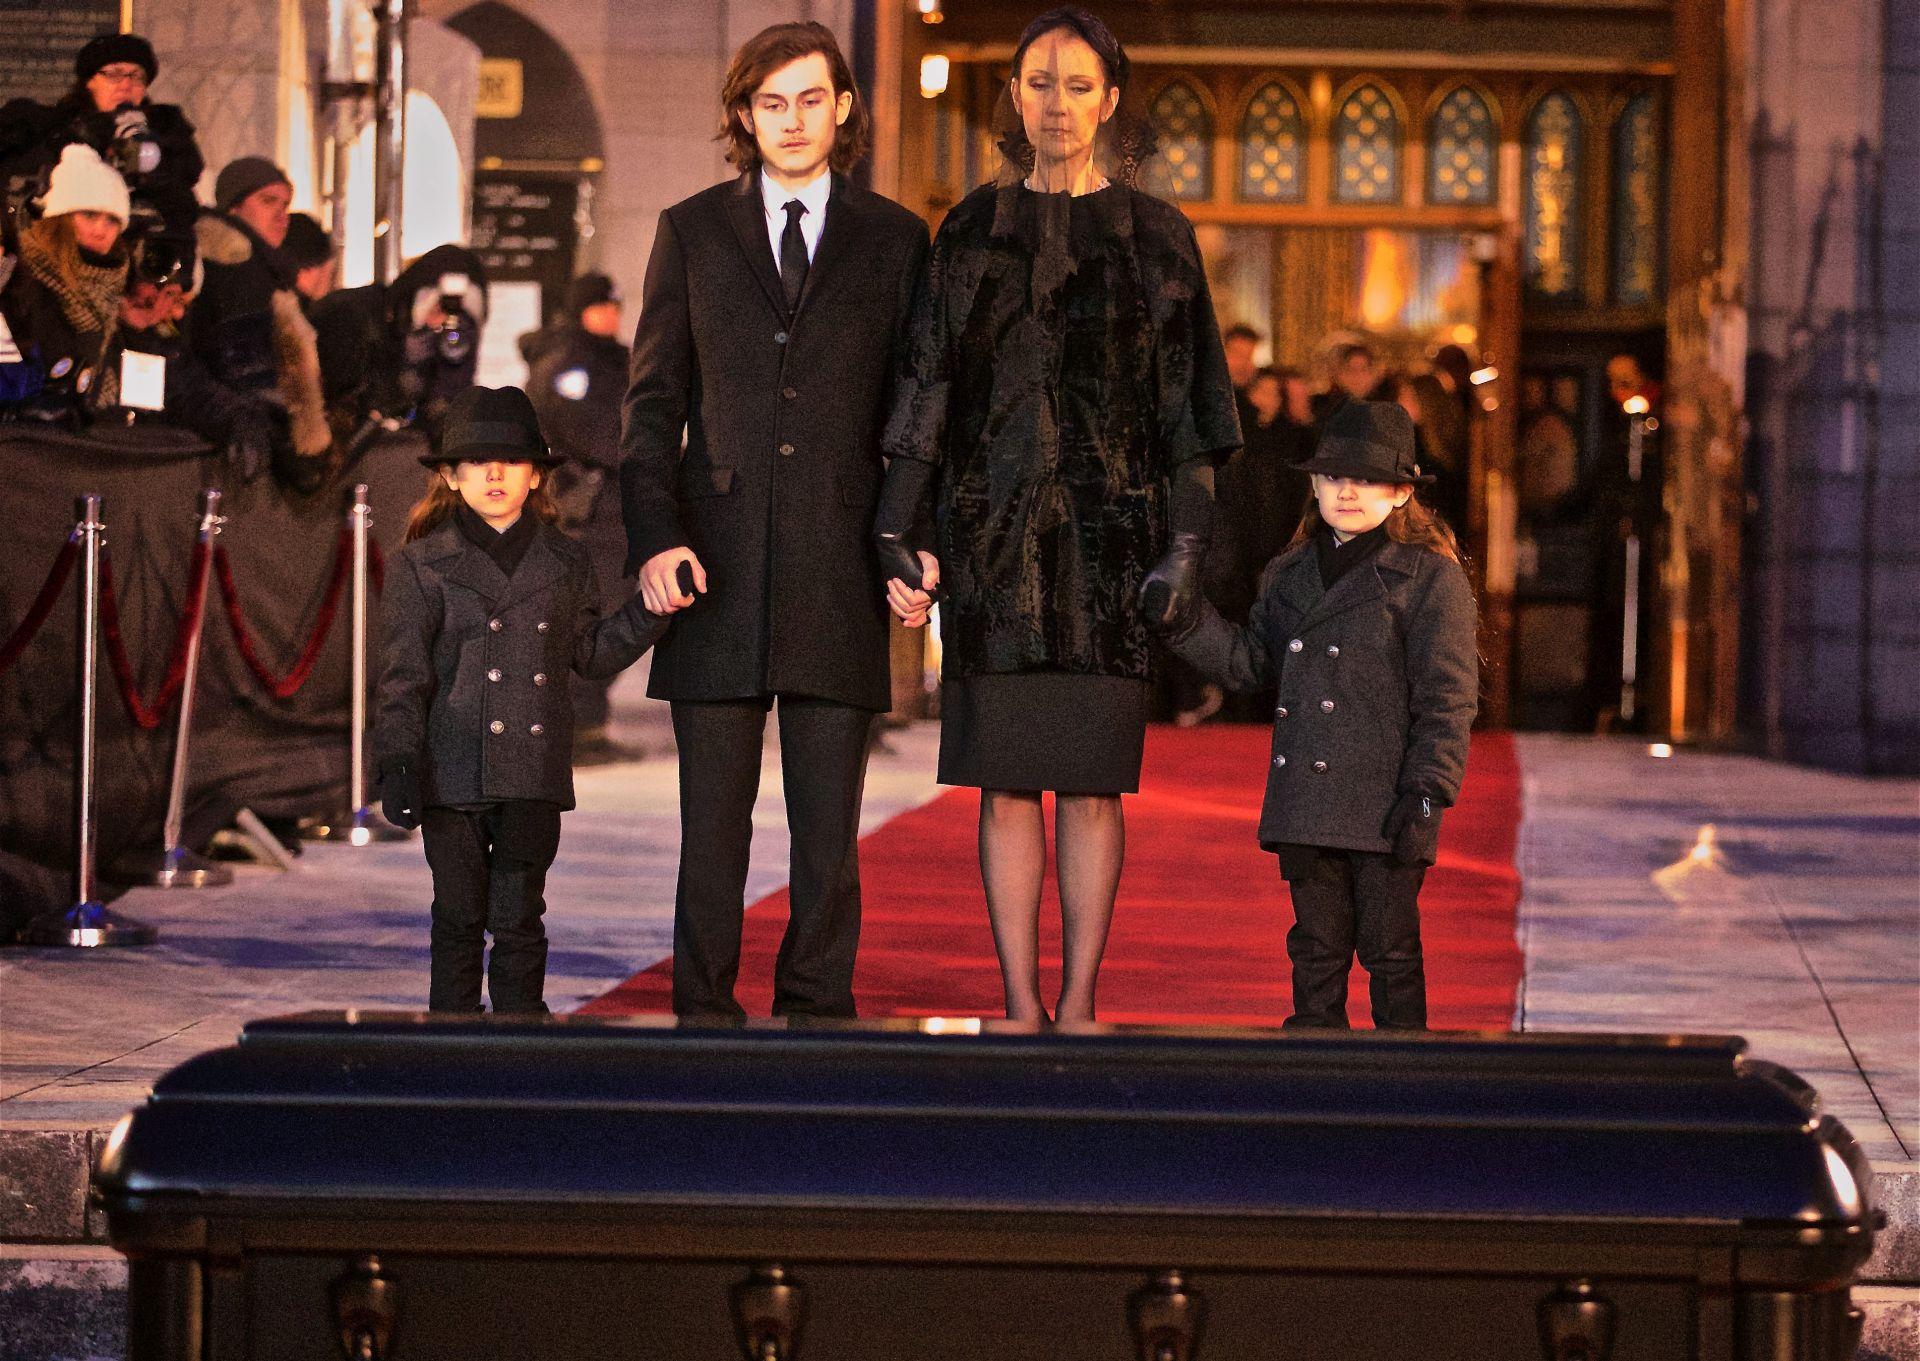 VIDEO: TUŽAN OPROŠTAJ U MONTREALU Celine Dion pokopala supruga